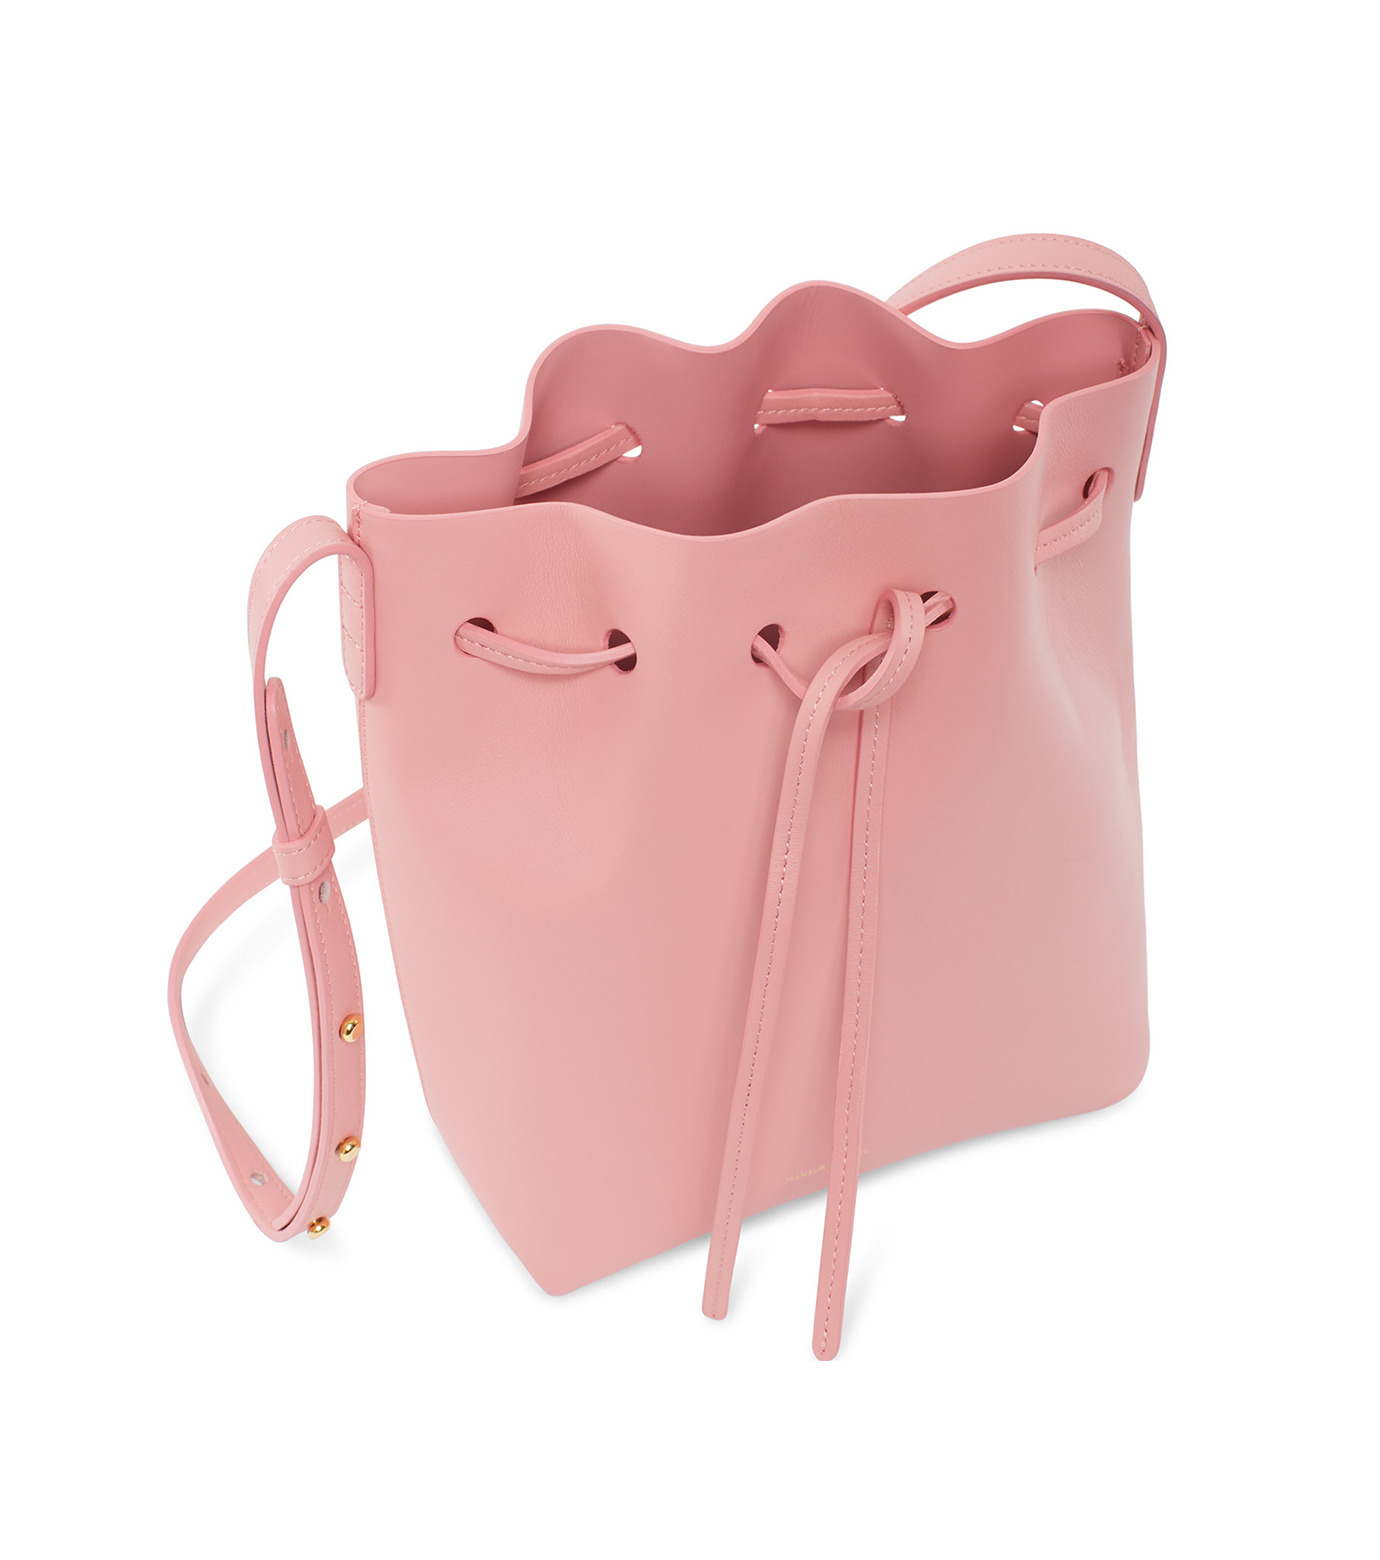 Mansur Gavriel(マンサーガブリエル)のMini Bucket Bag-PINK(バッグ/bag)-HMB004CA-72 拡大詳細画像3